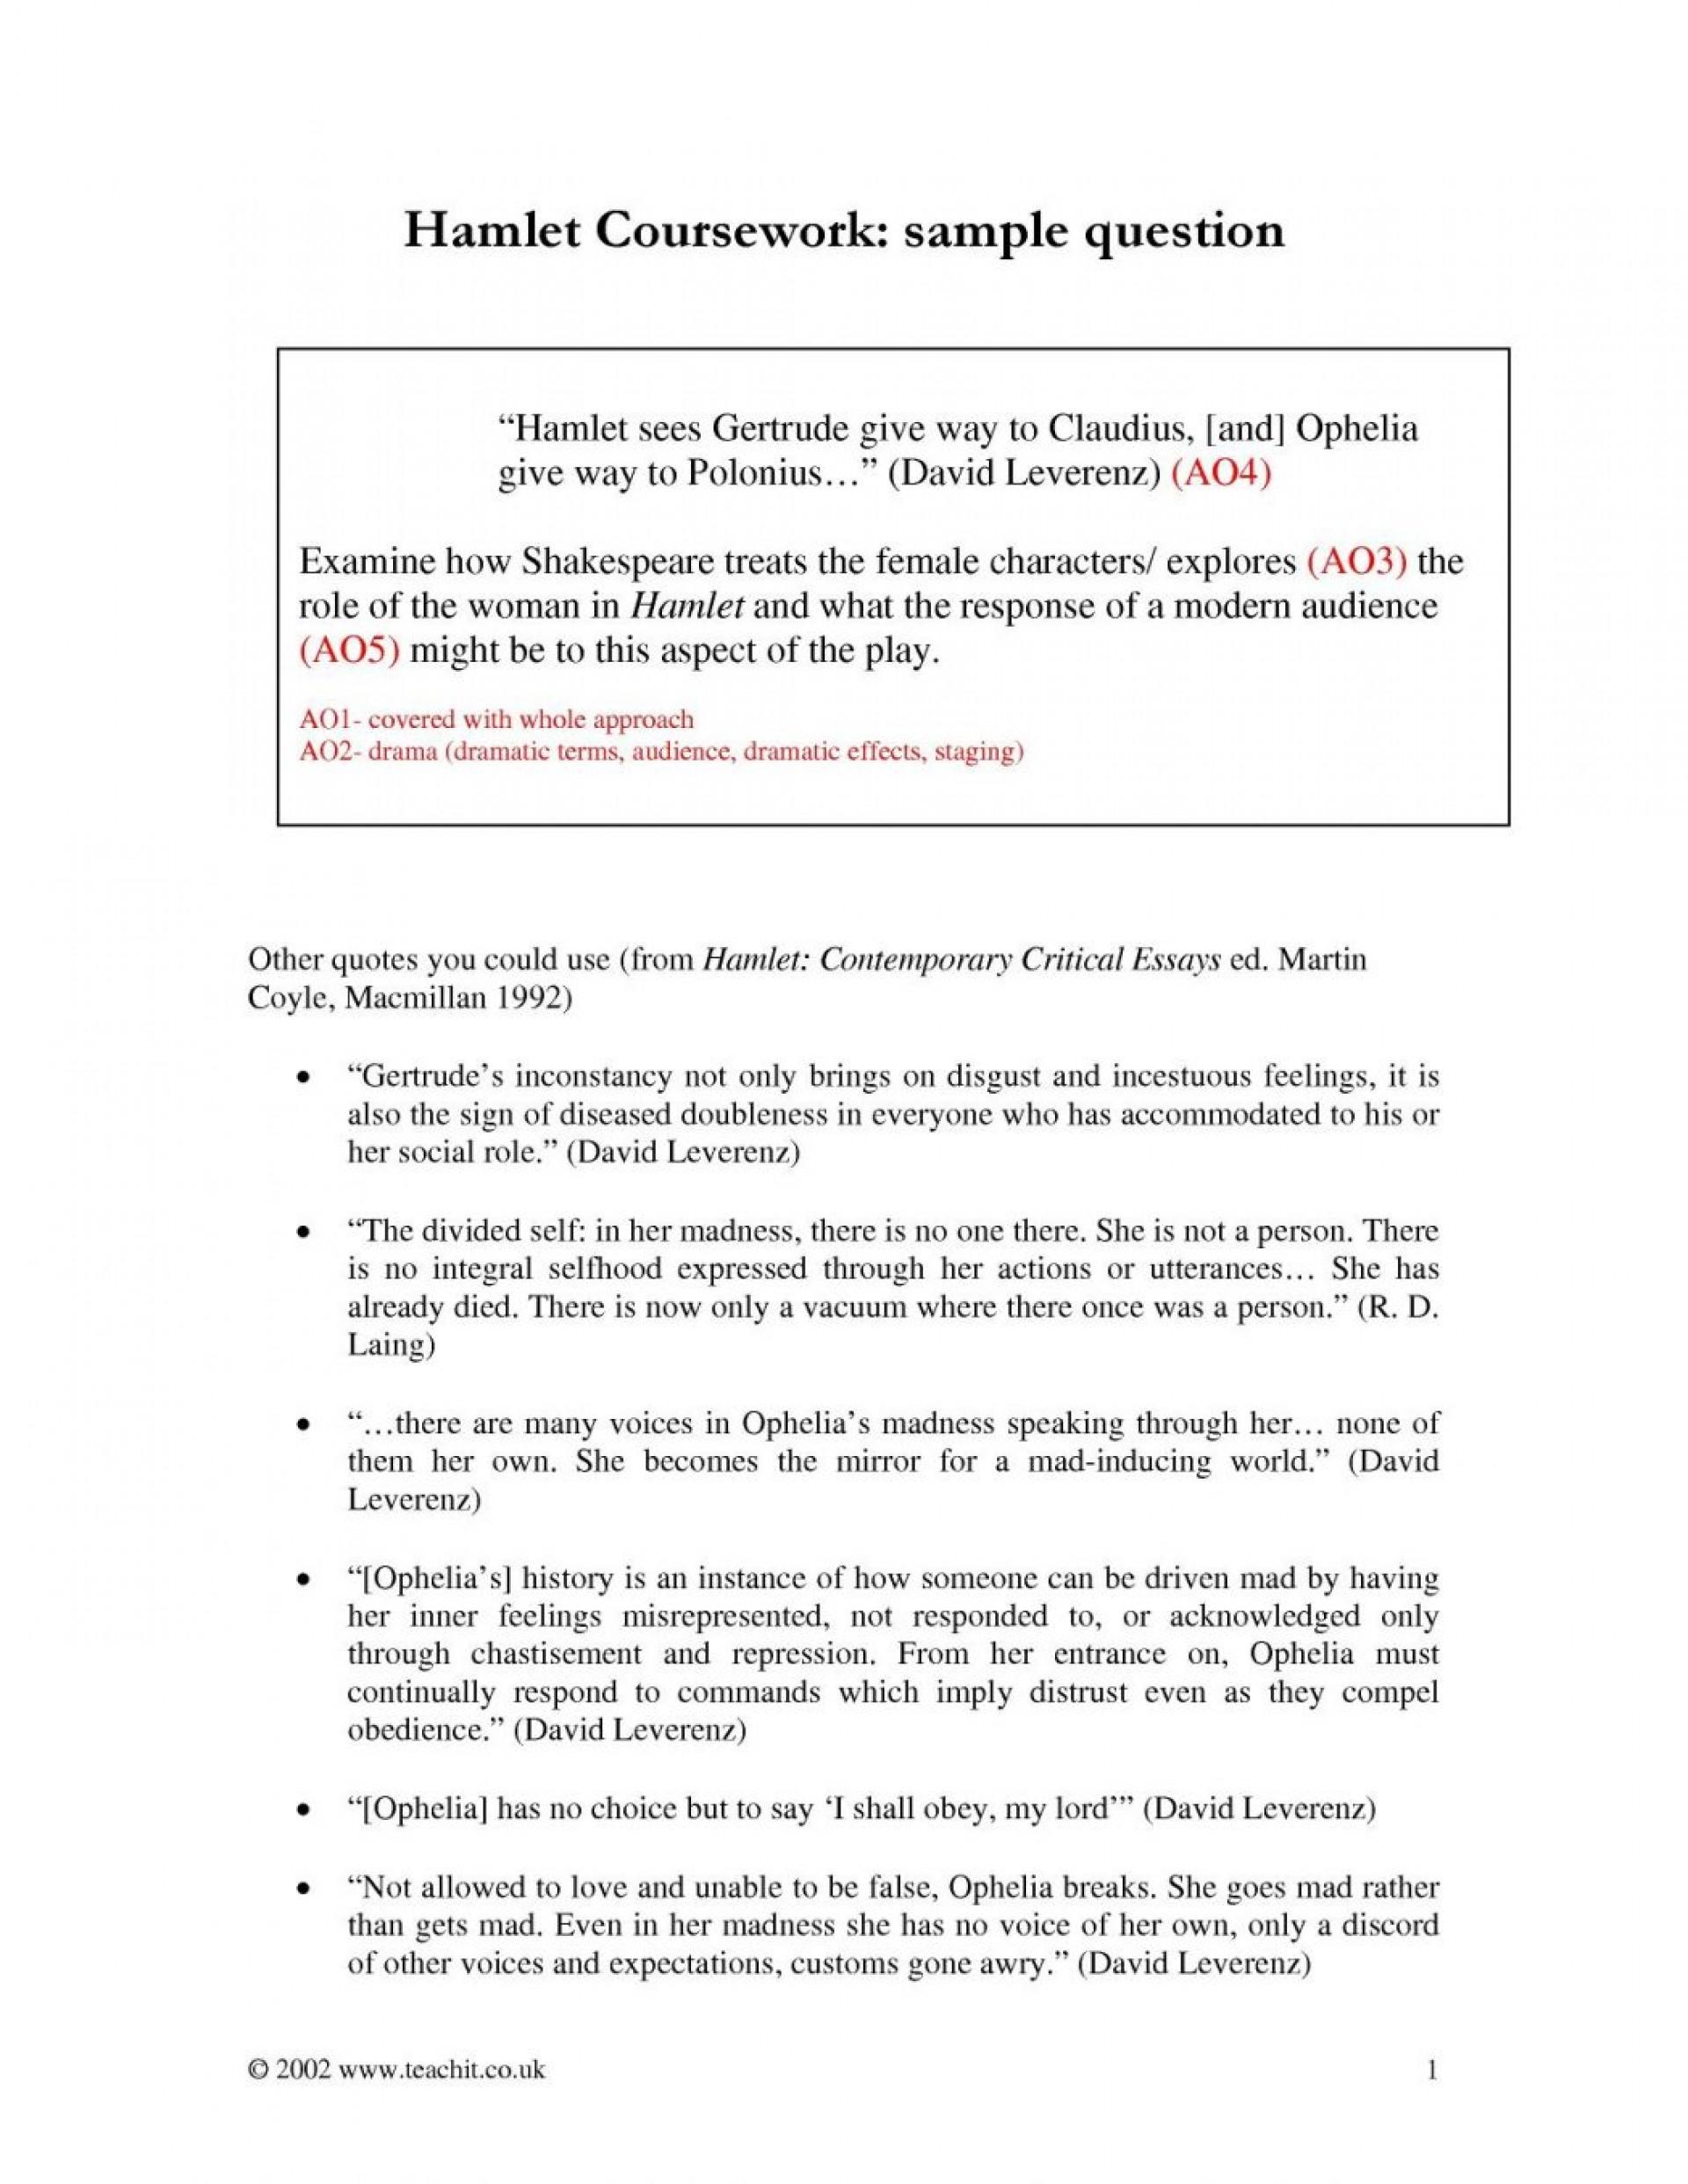 009 Essay Example Hamlet On Revenge Topics Outline 1048x1356 Stupendous Madness Plan Theme Conclusion 1920